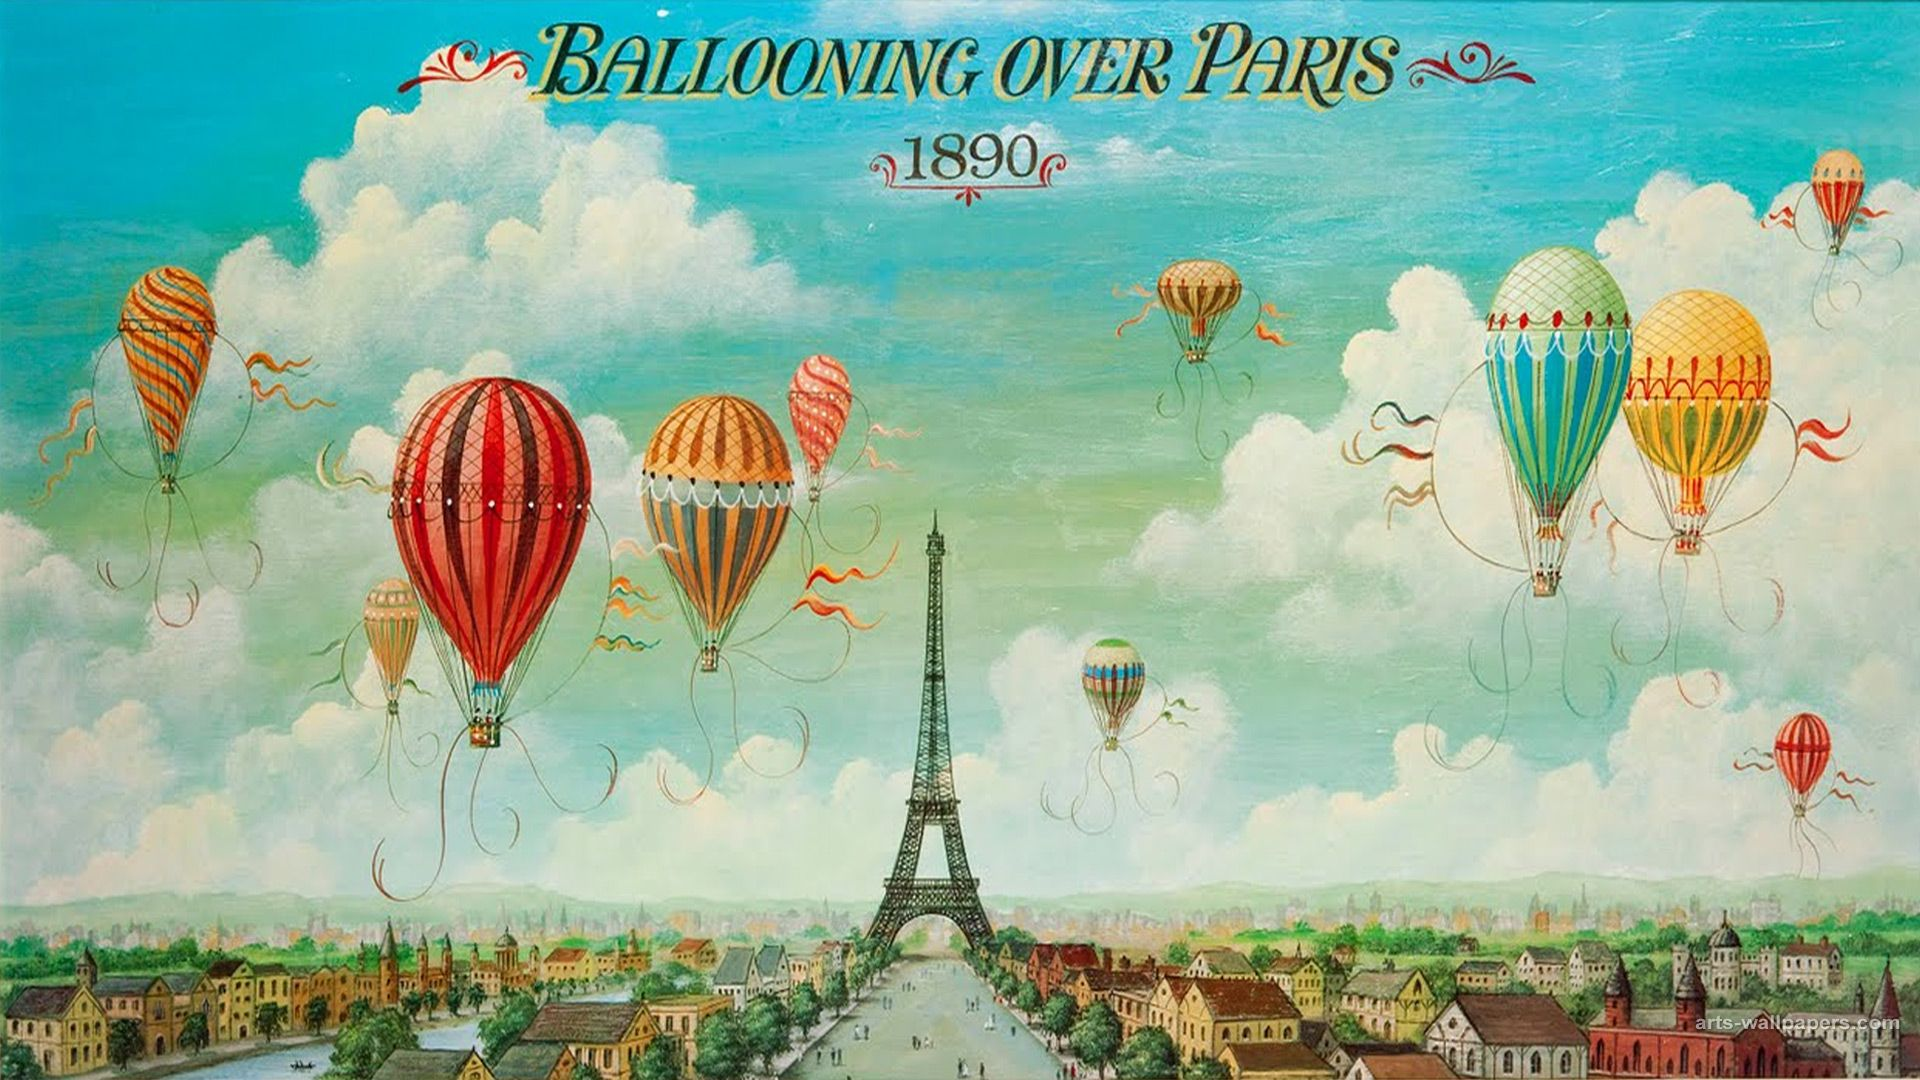 Art Posters Ballooning Over Paris 1890 Wallpaper Vintage Poster